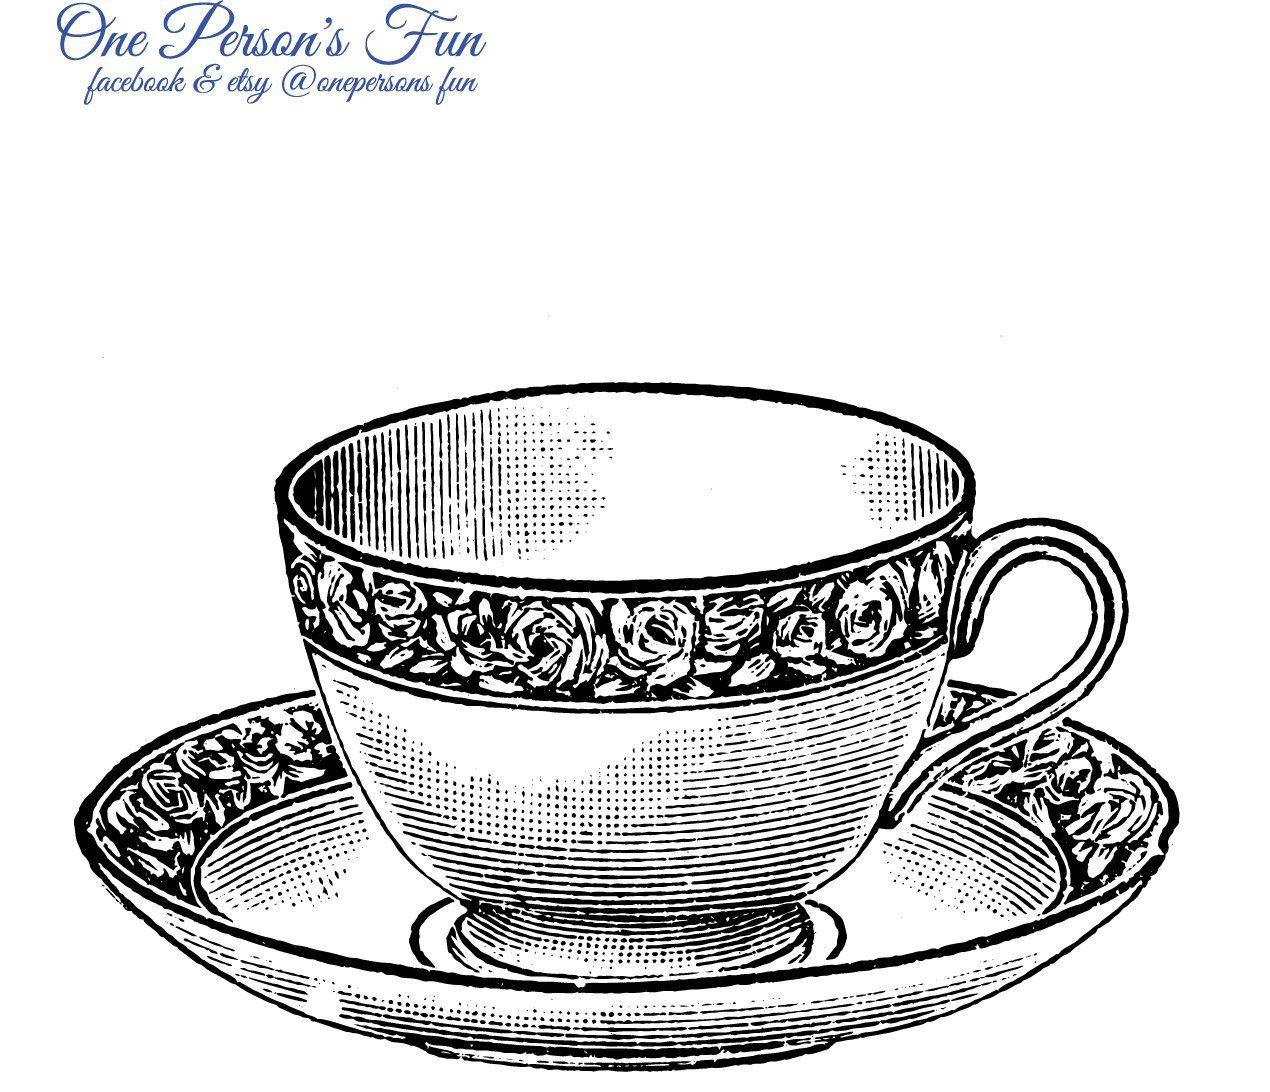 Vintage teacup clipart clip art black and white library Vintage Teacup Transparent PNG | vintage clip art | Tea cups ... clip art black and white library